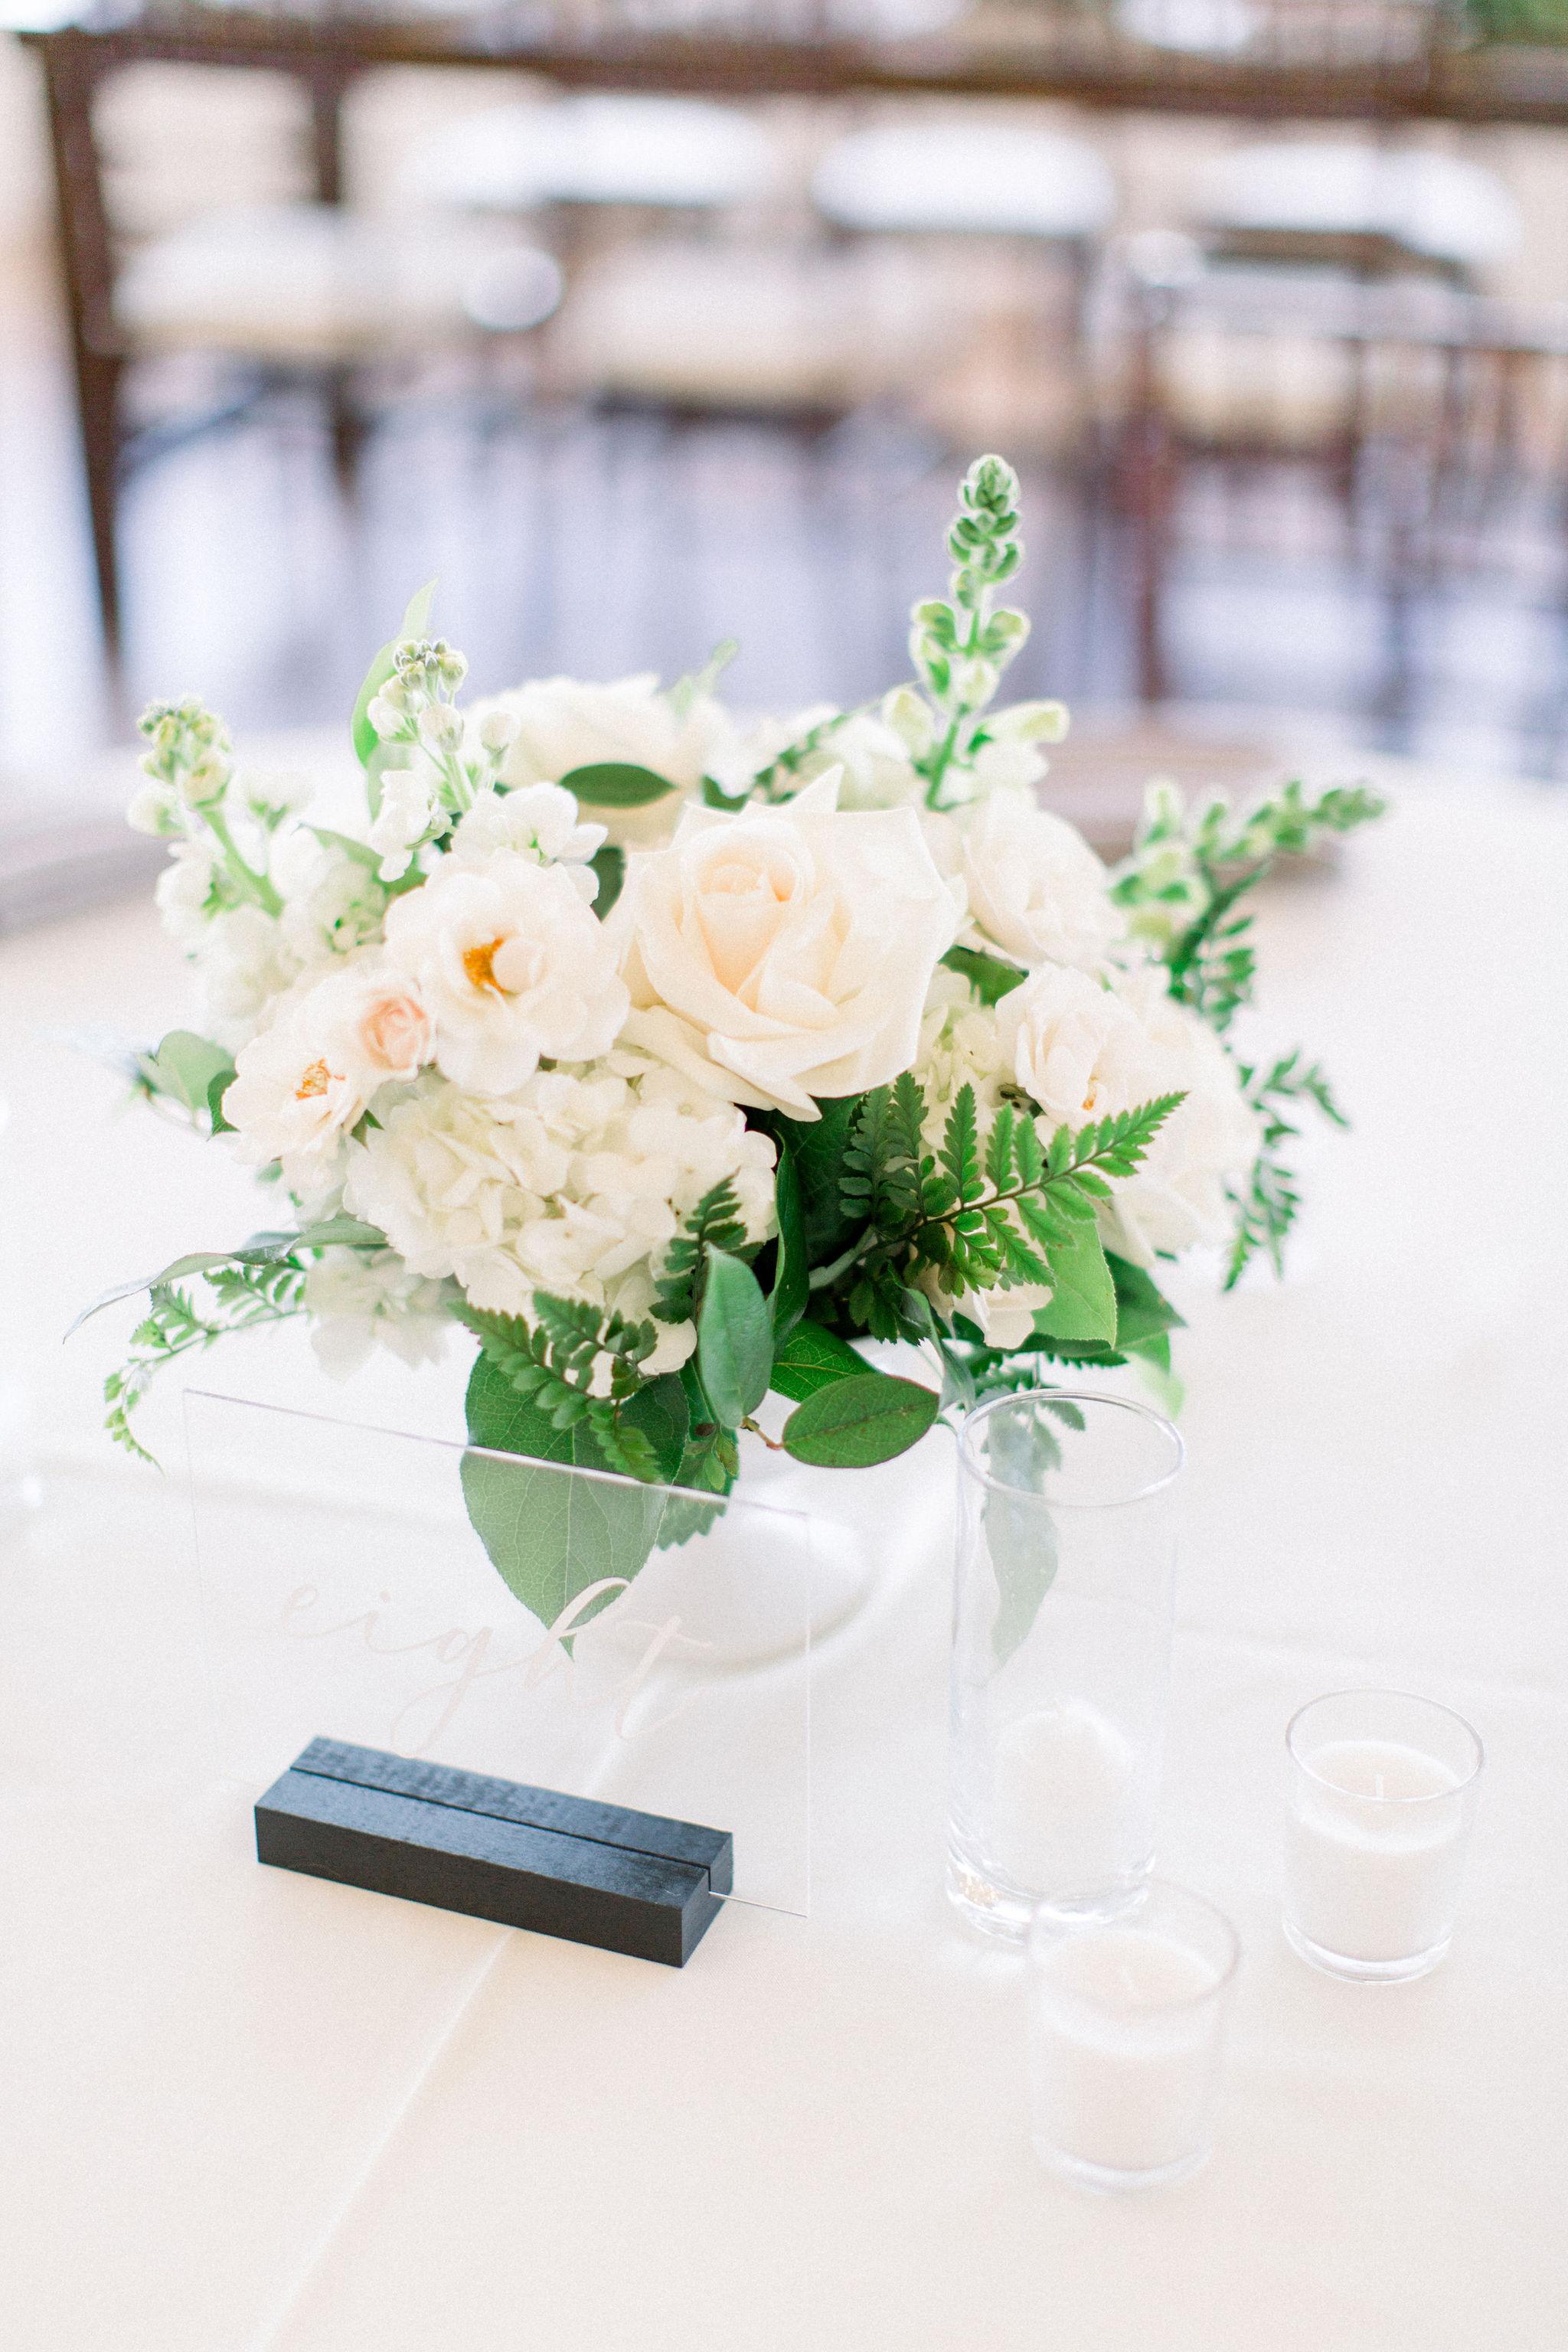 sydney-bodi-wedding-budget-friendly-blooms-carmel-mountain-white-flowers-3.jpg